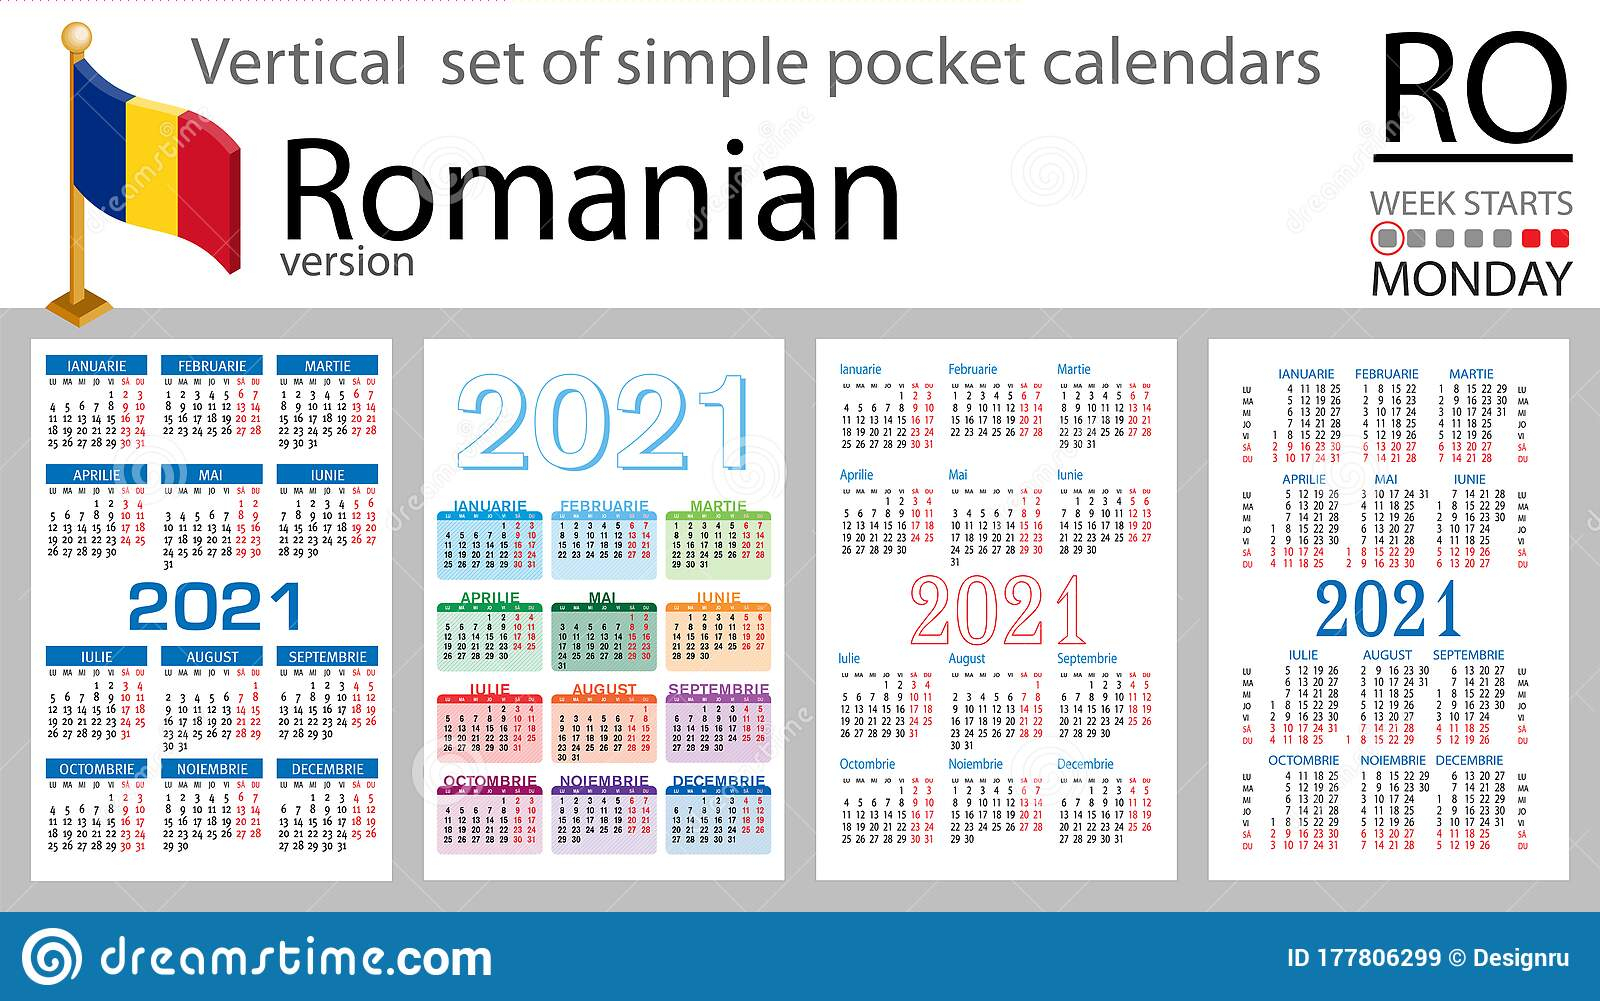 Romanian Vertical Pocket Calendar For 2021 Stock Vector within Pocket Calendar 2021-2021: Two Year